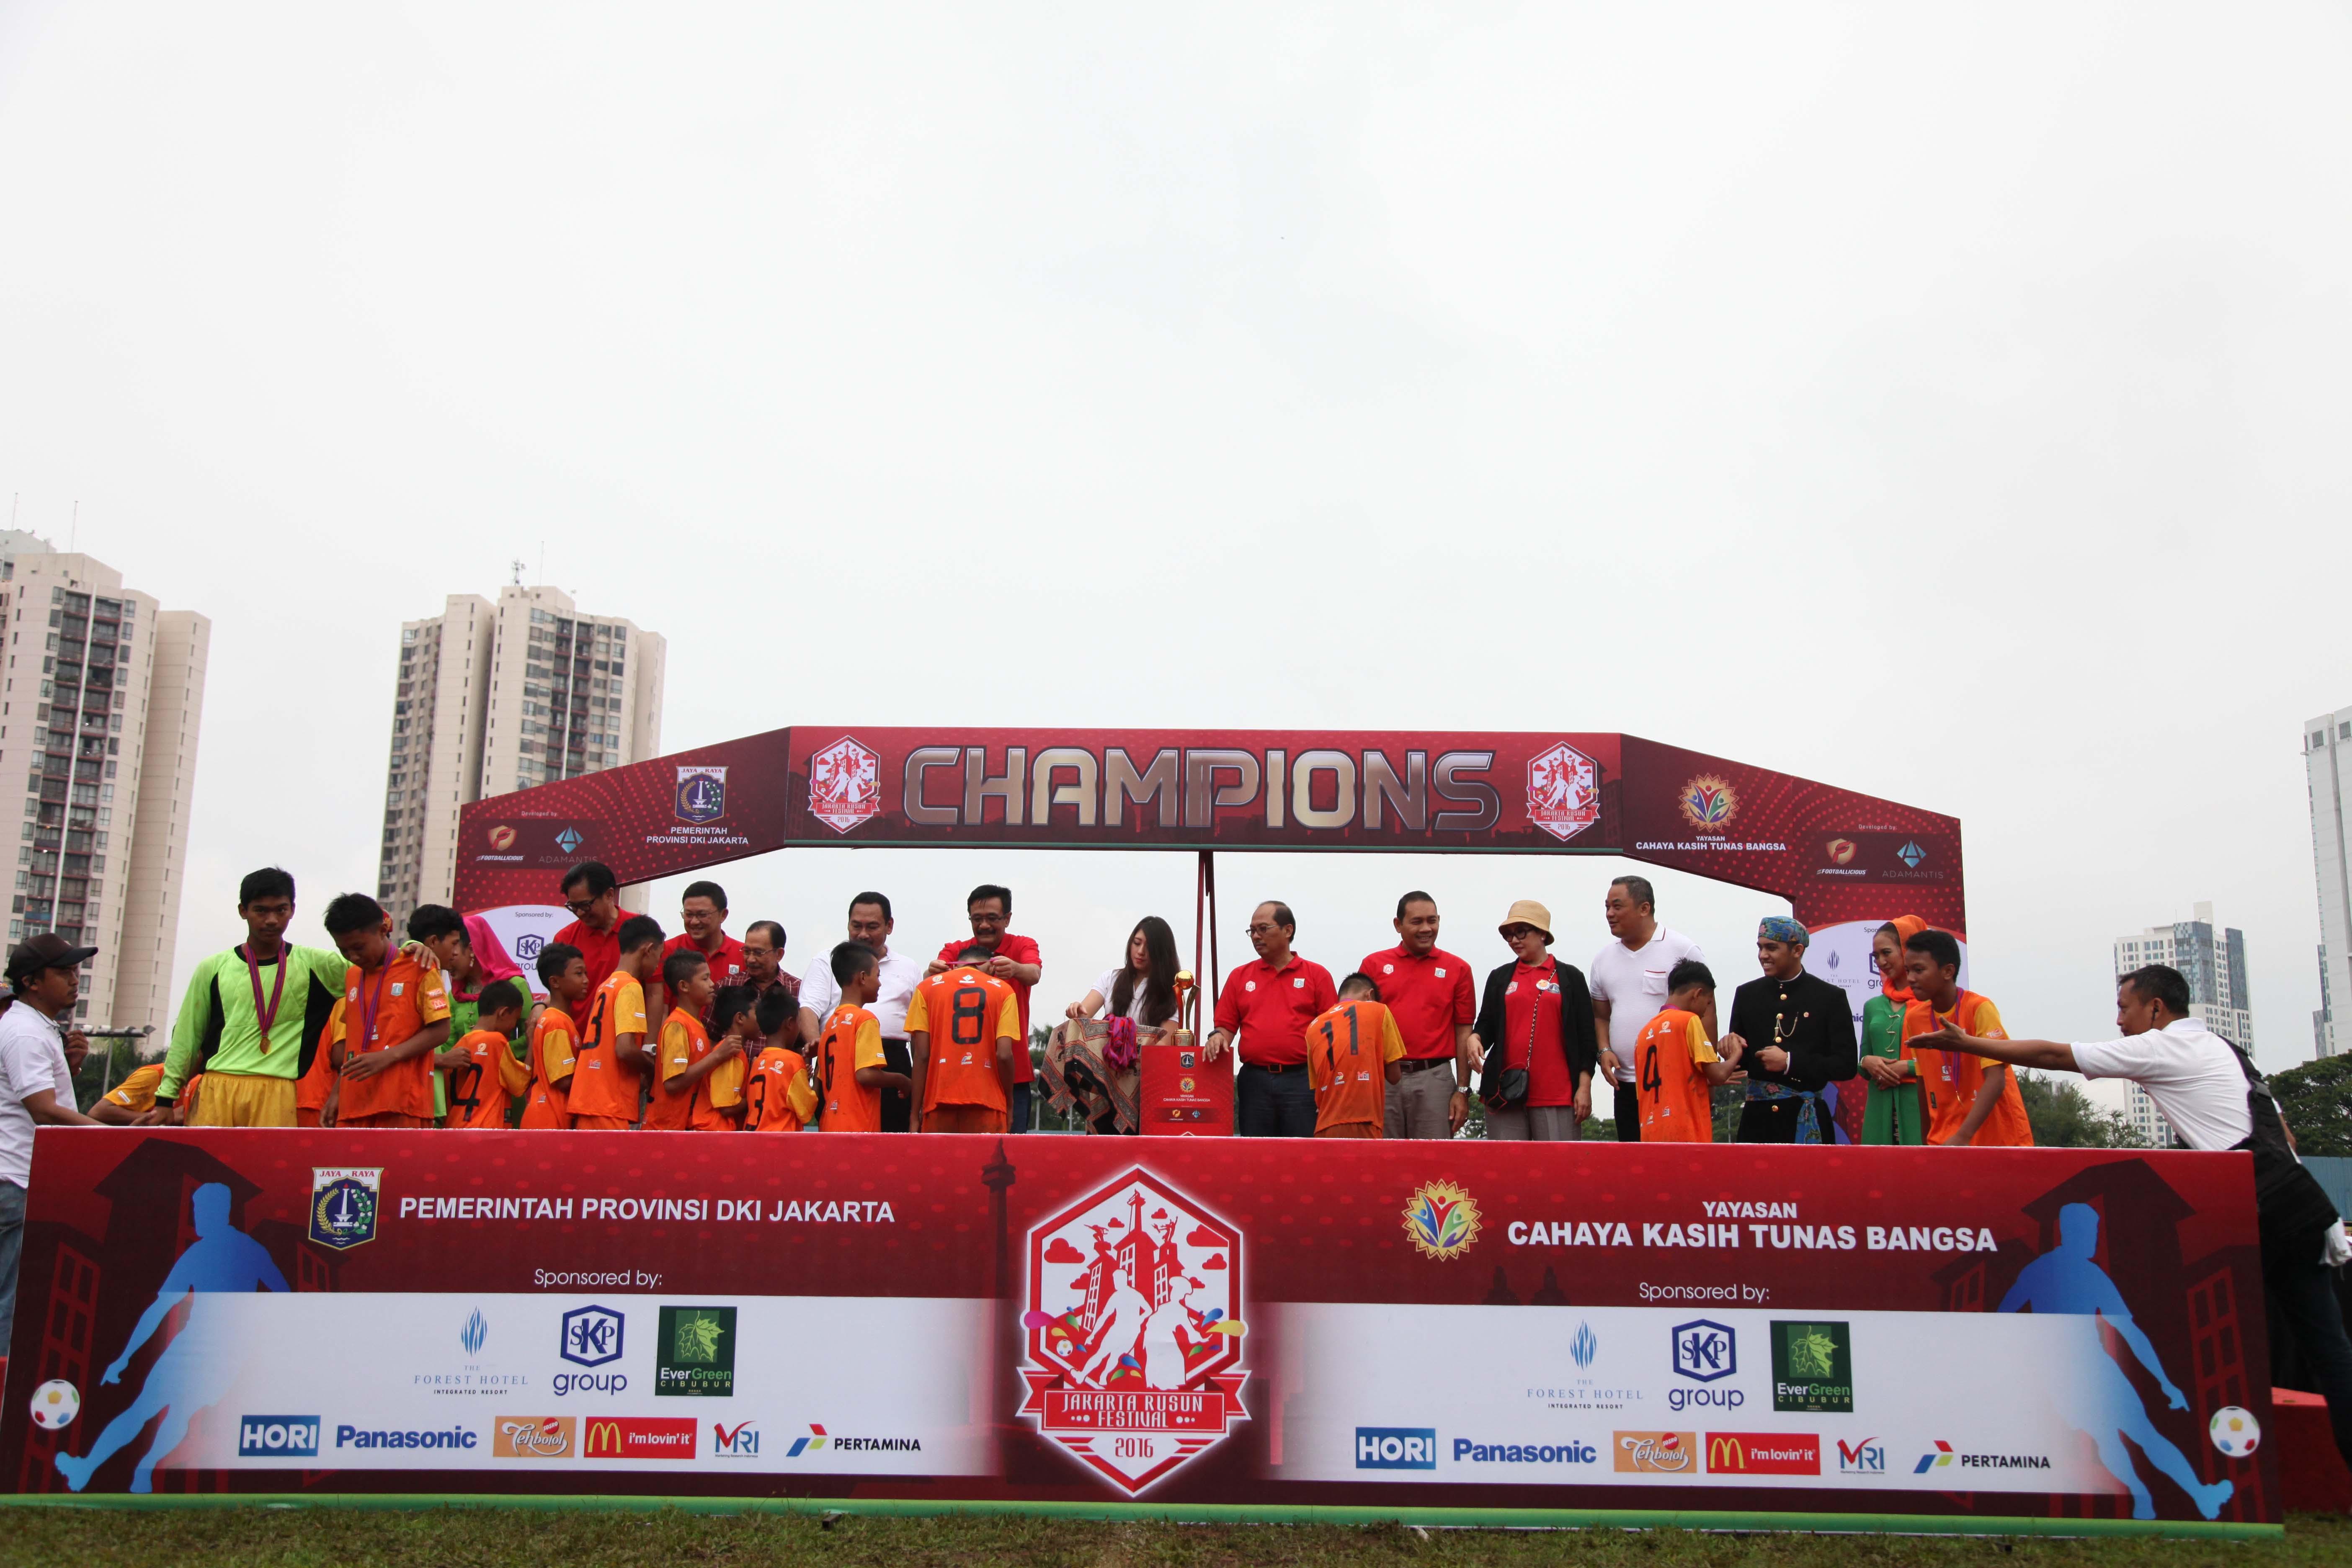 FOTO FINAL JRF 2016 (20) juara